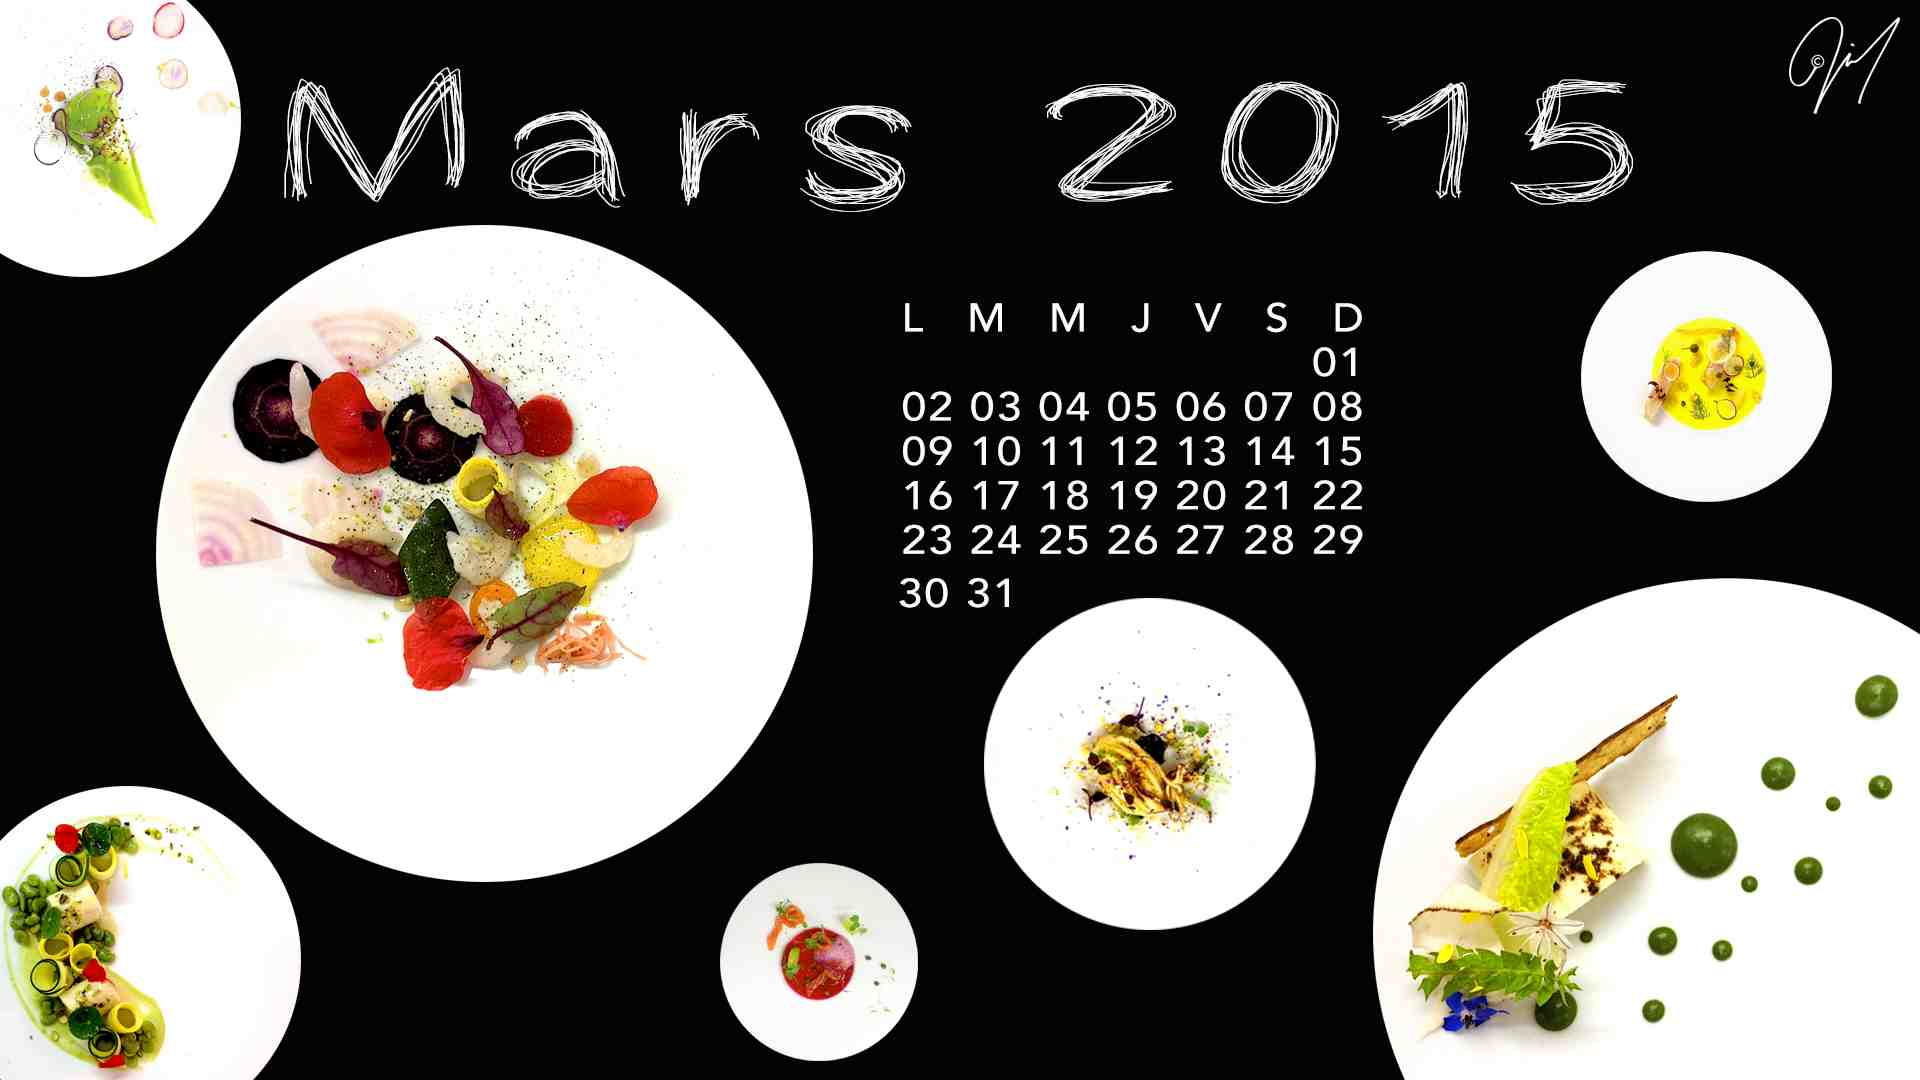 Fond d'Écran | Calendrier Gourmand | Mars 2015